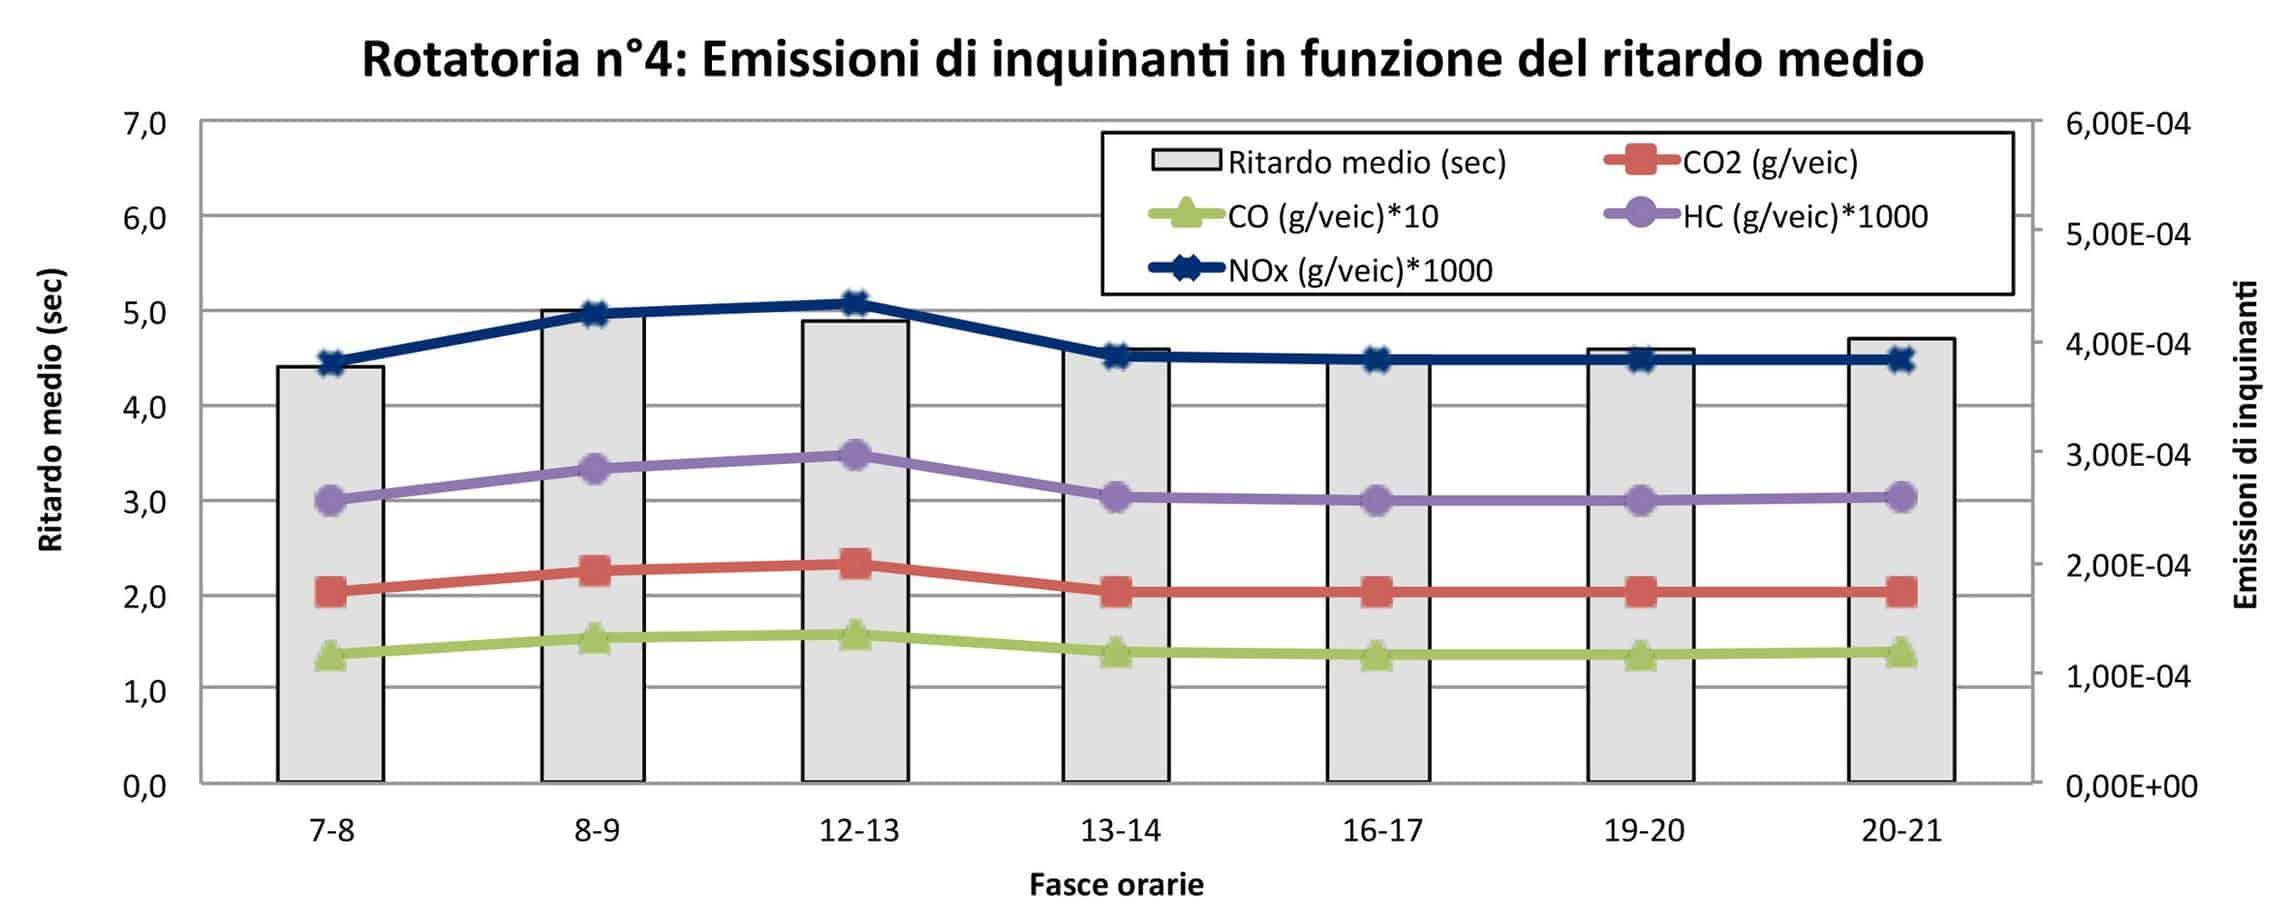 Le emissioni di inquinanti in funzione del ritardo medio (rotatoria n° 4)